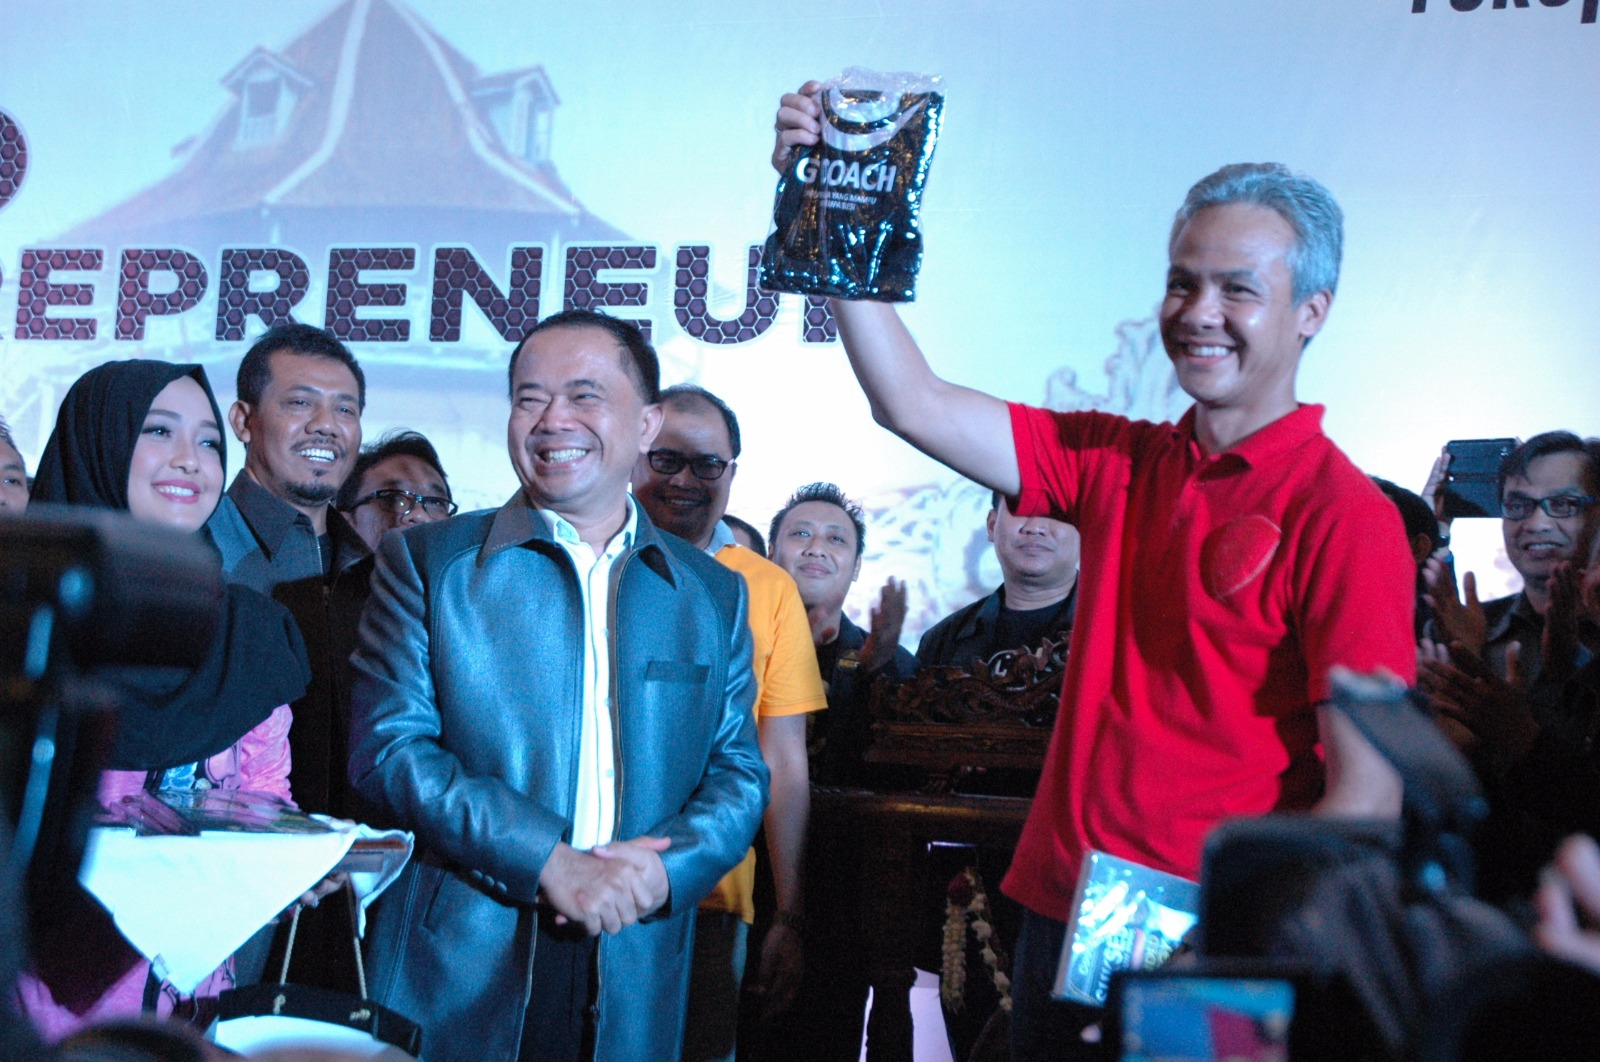 Gubernur Ganjar Pranowo hadir di Solo Entrepreneur Days 2017